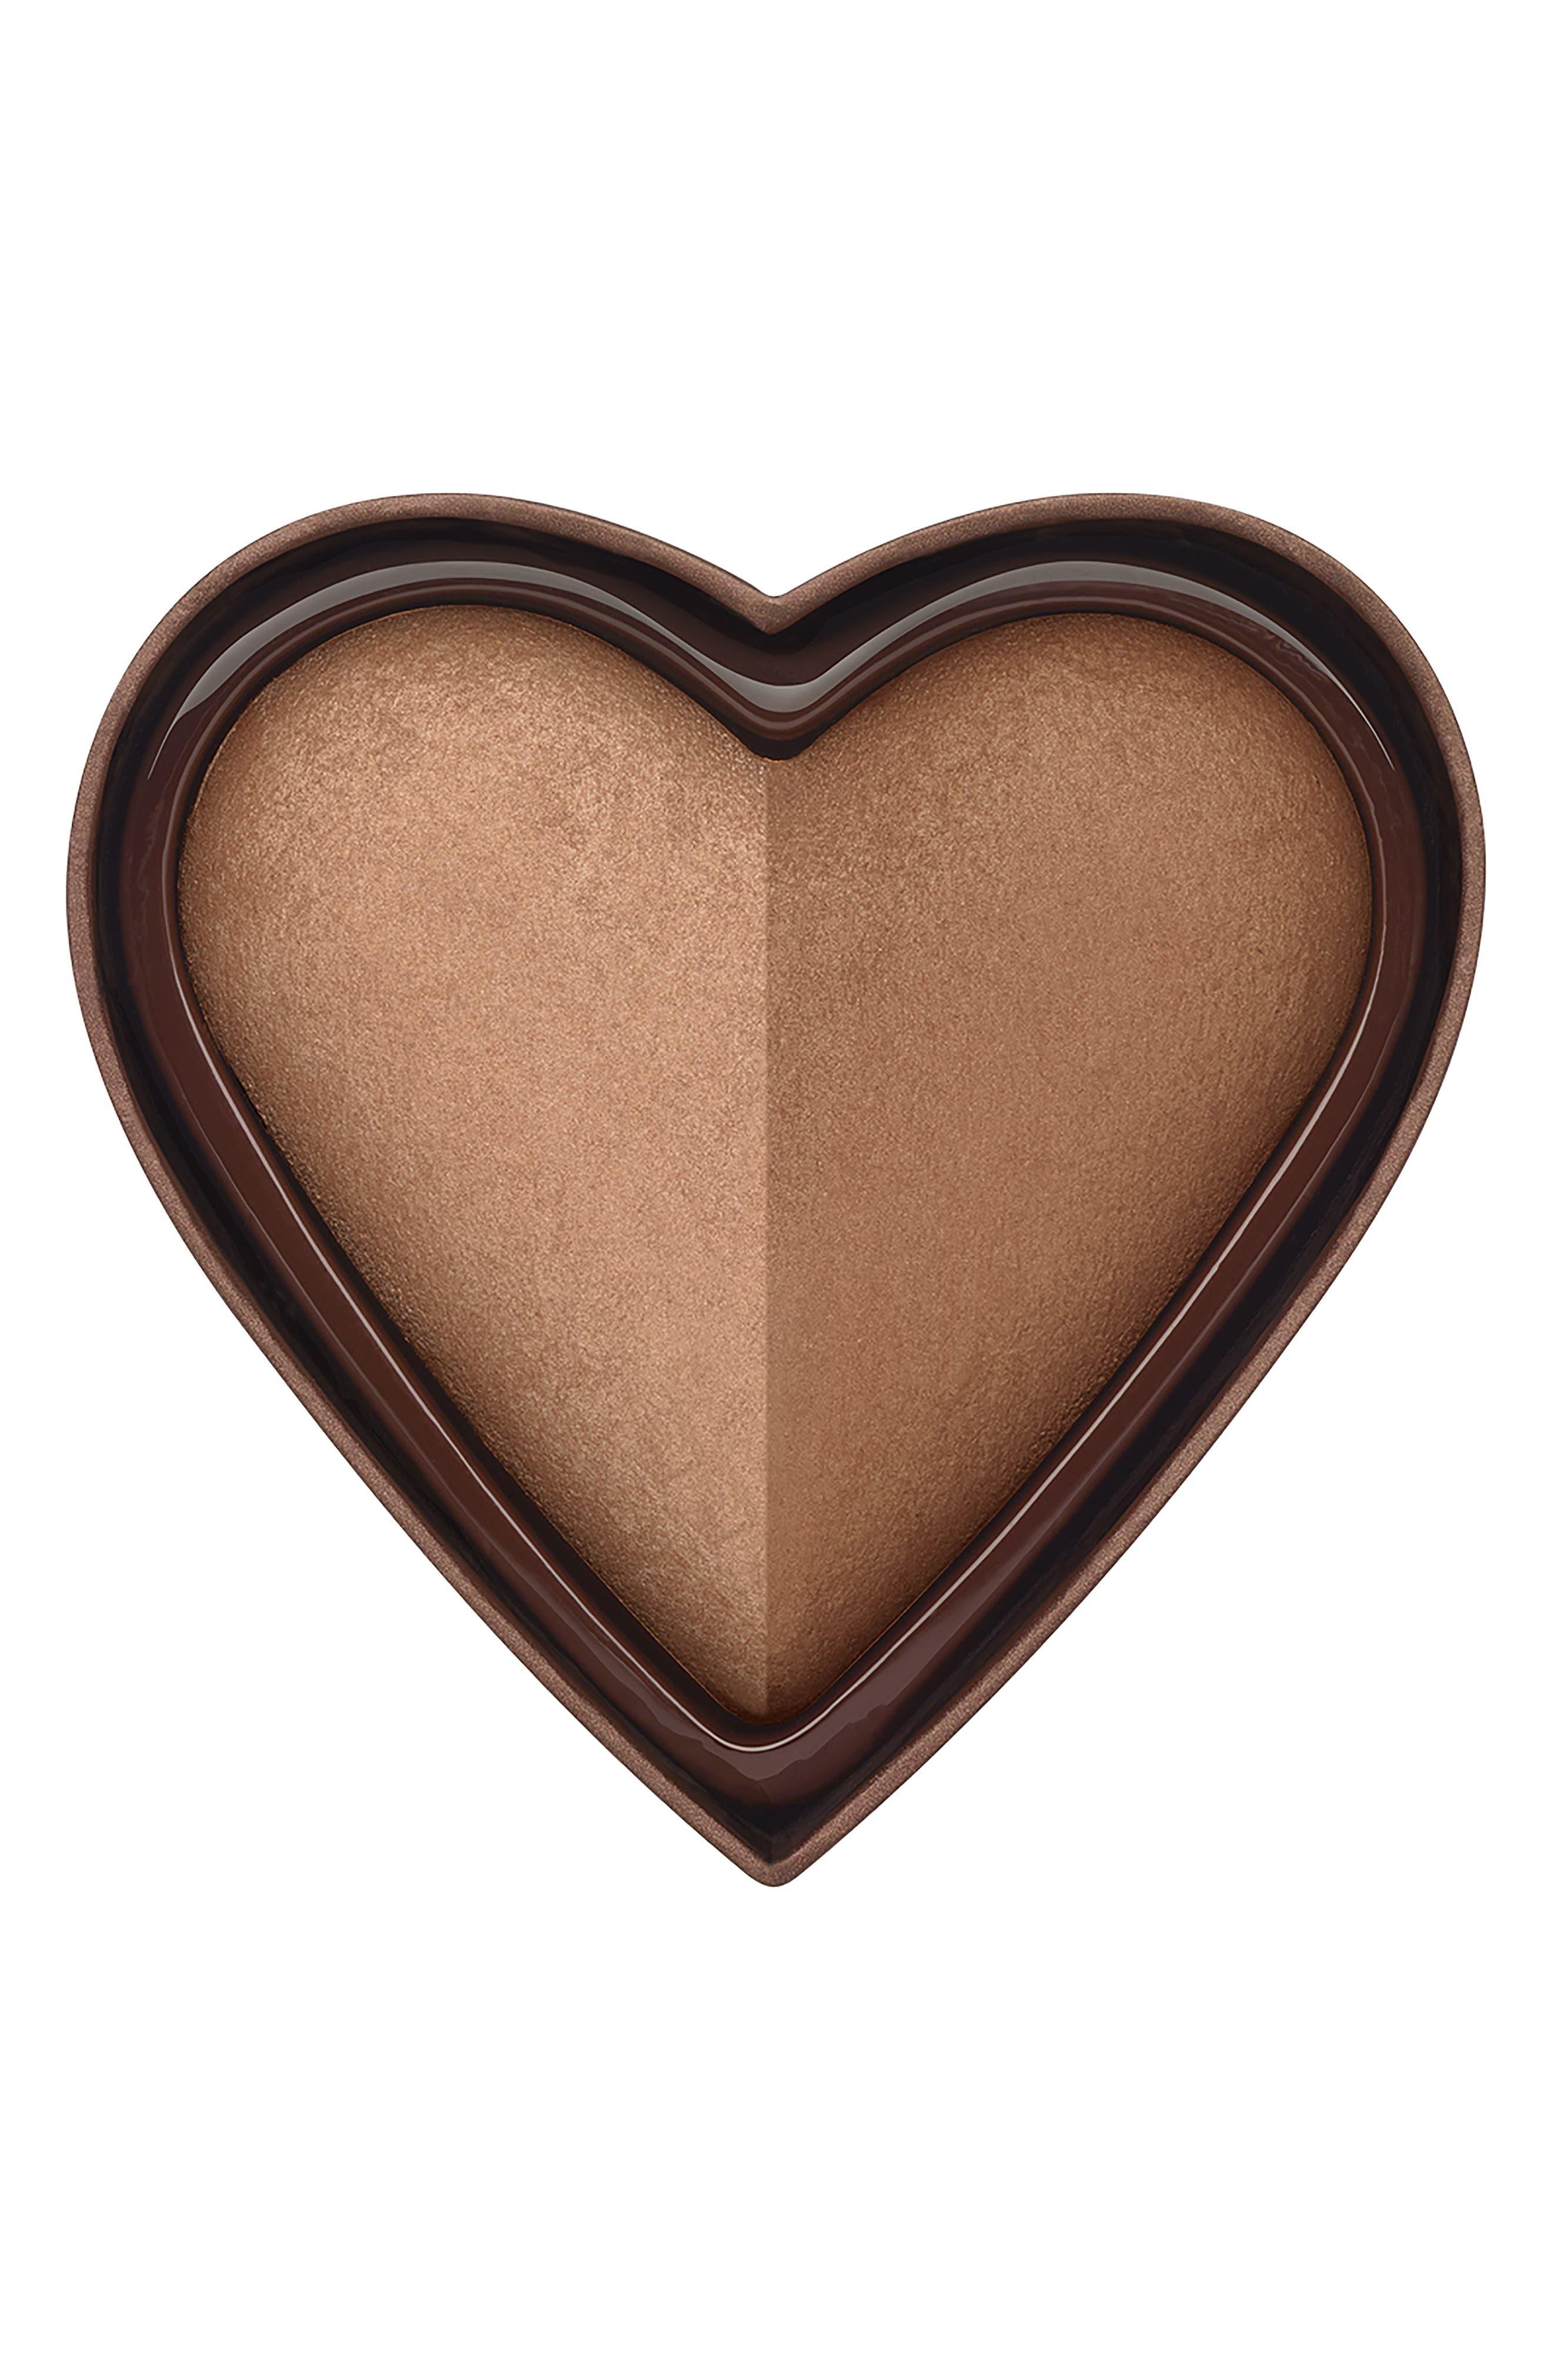 Sweethearts Bronzer,                             Alternate thumbnail 3, color,                             Sweet Tea